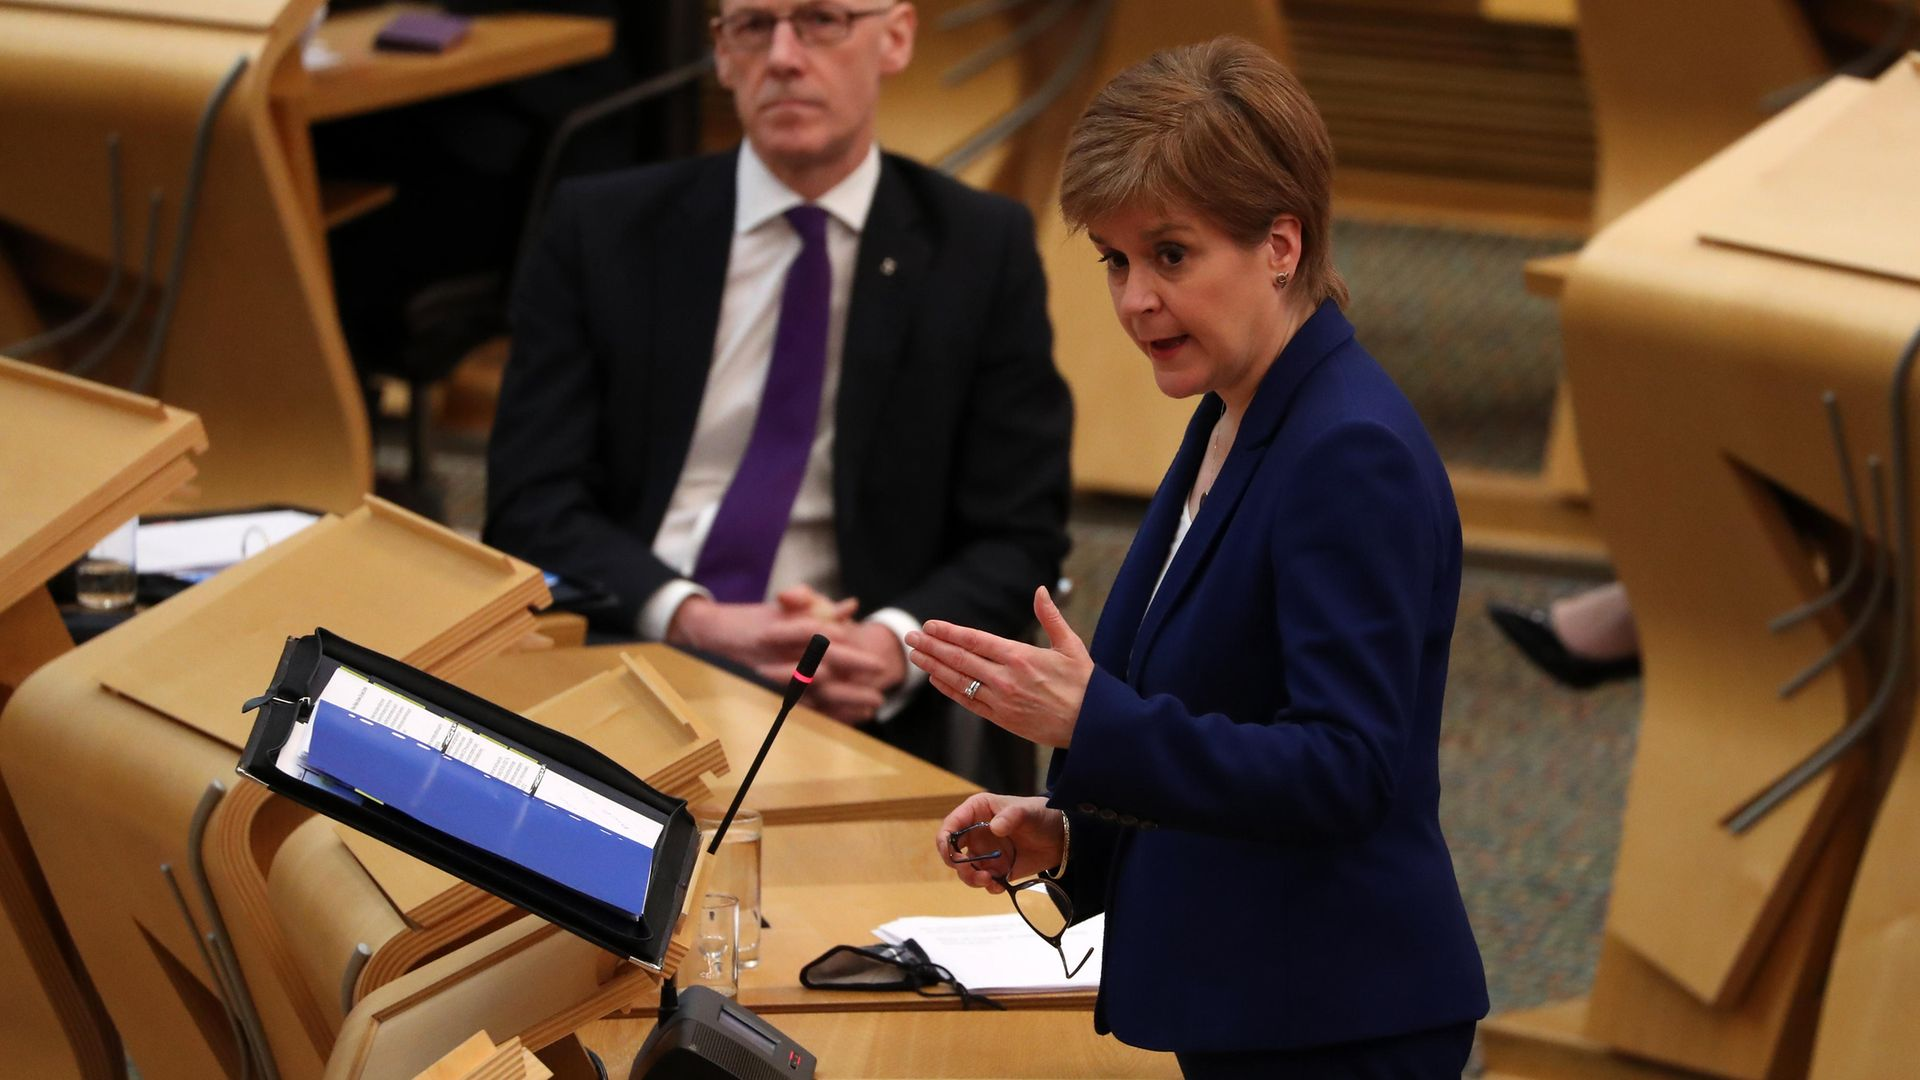 First minister Nicola Sturgeon in the Scottish parliament in Edinburgh - Credit: PA